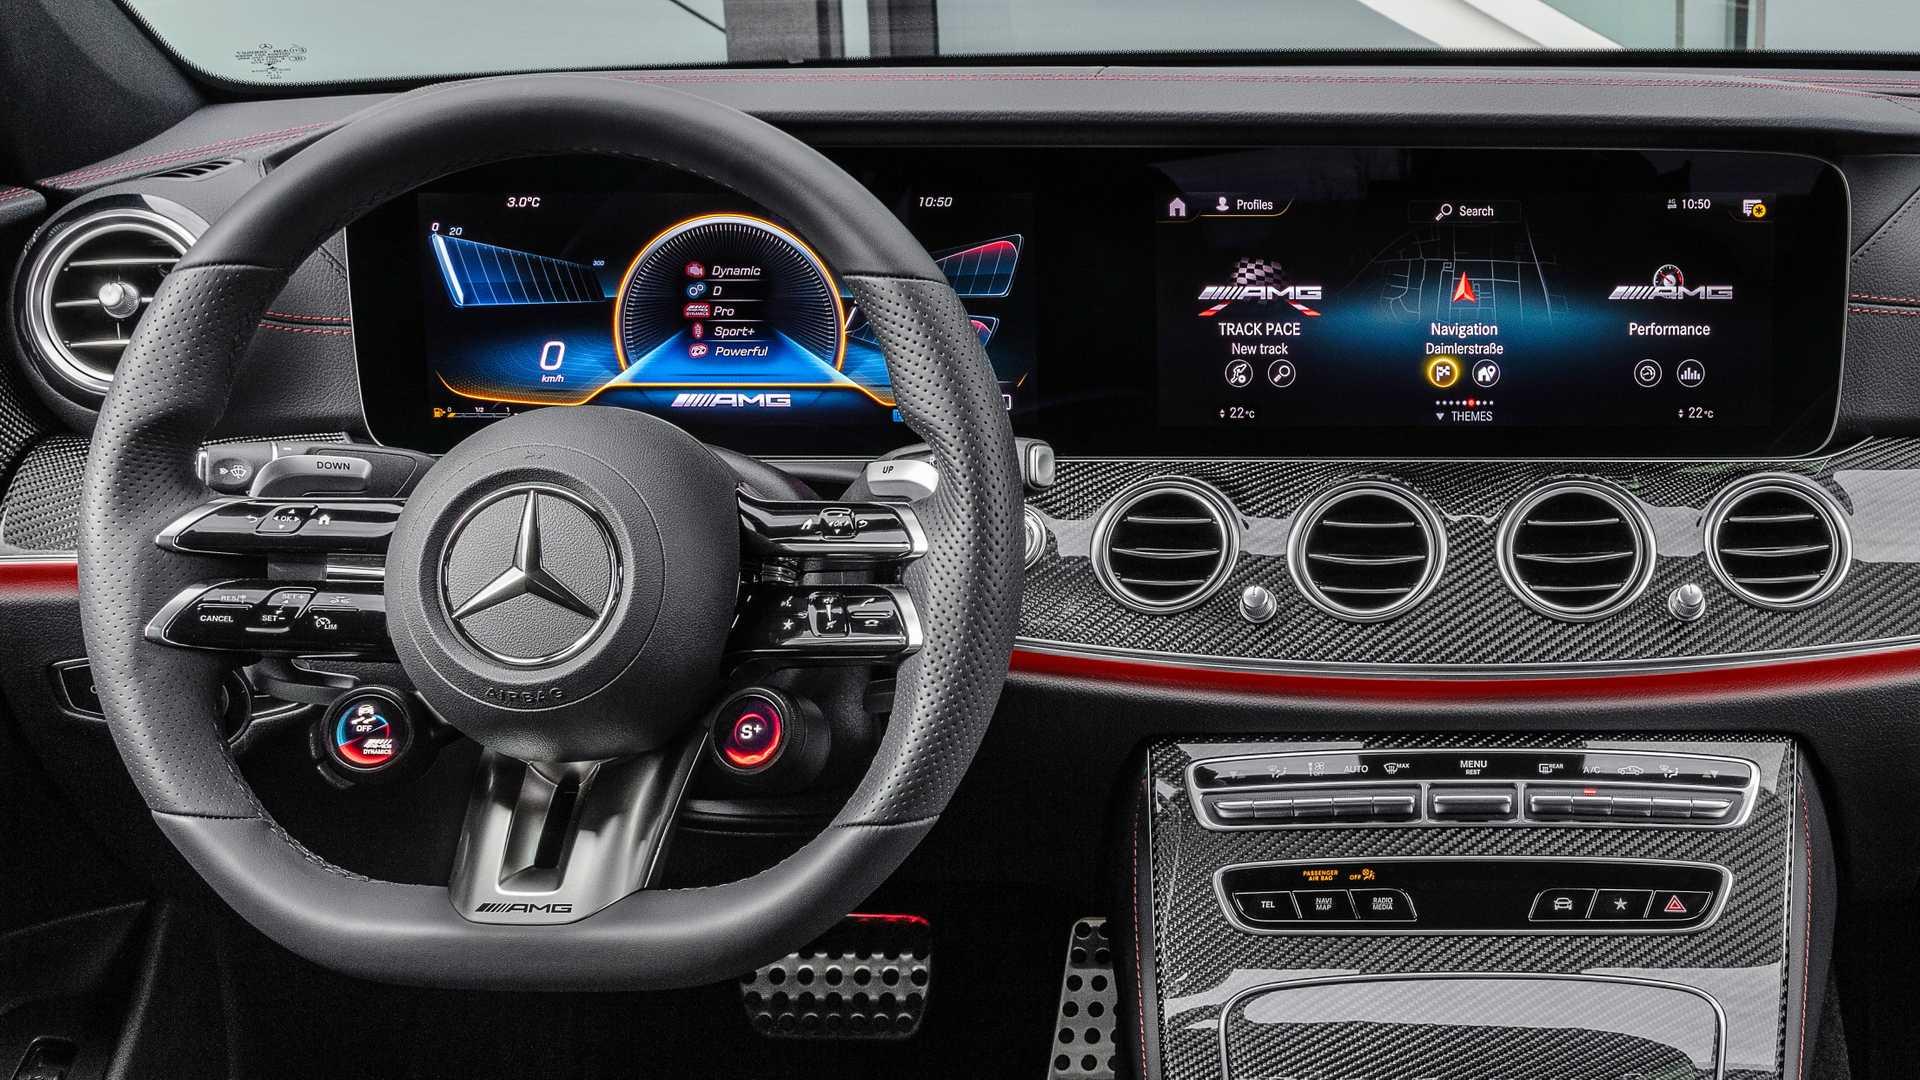 Mercedes-Benz E-класса полностью обновился 4